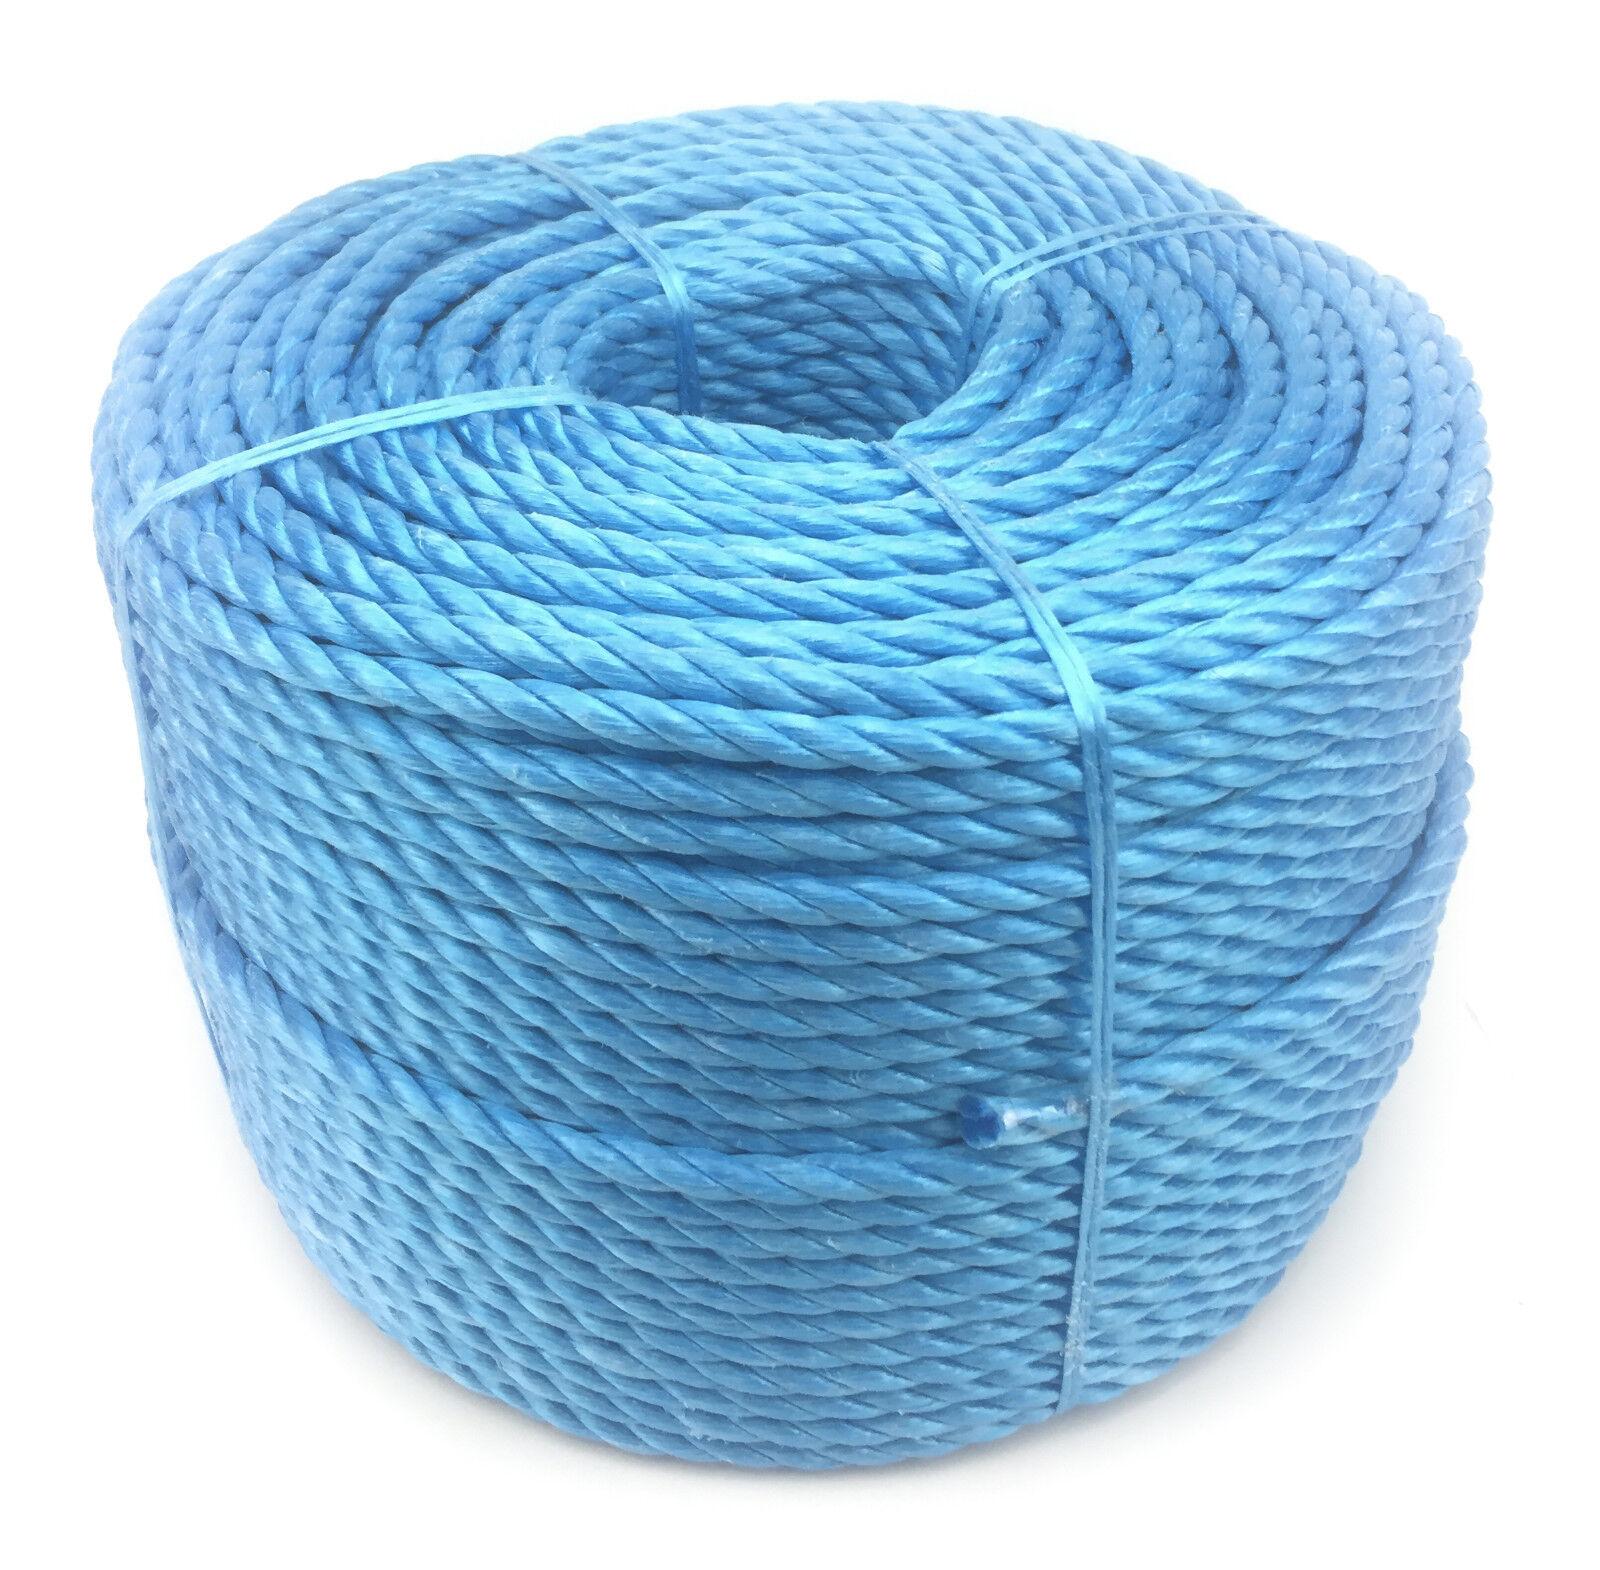 16mm blau POLYPROPYLEN SEIL x 100 Meter, Poly-Seil Rollen, preiswert Nylon Seil